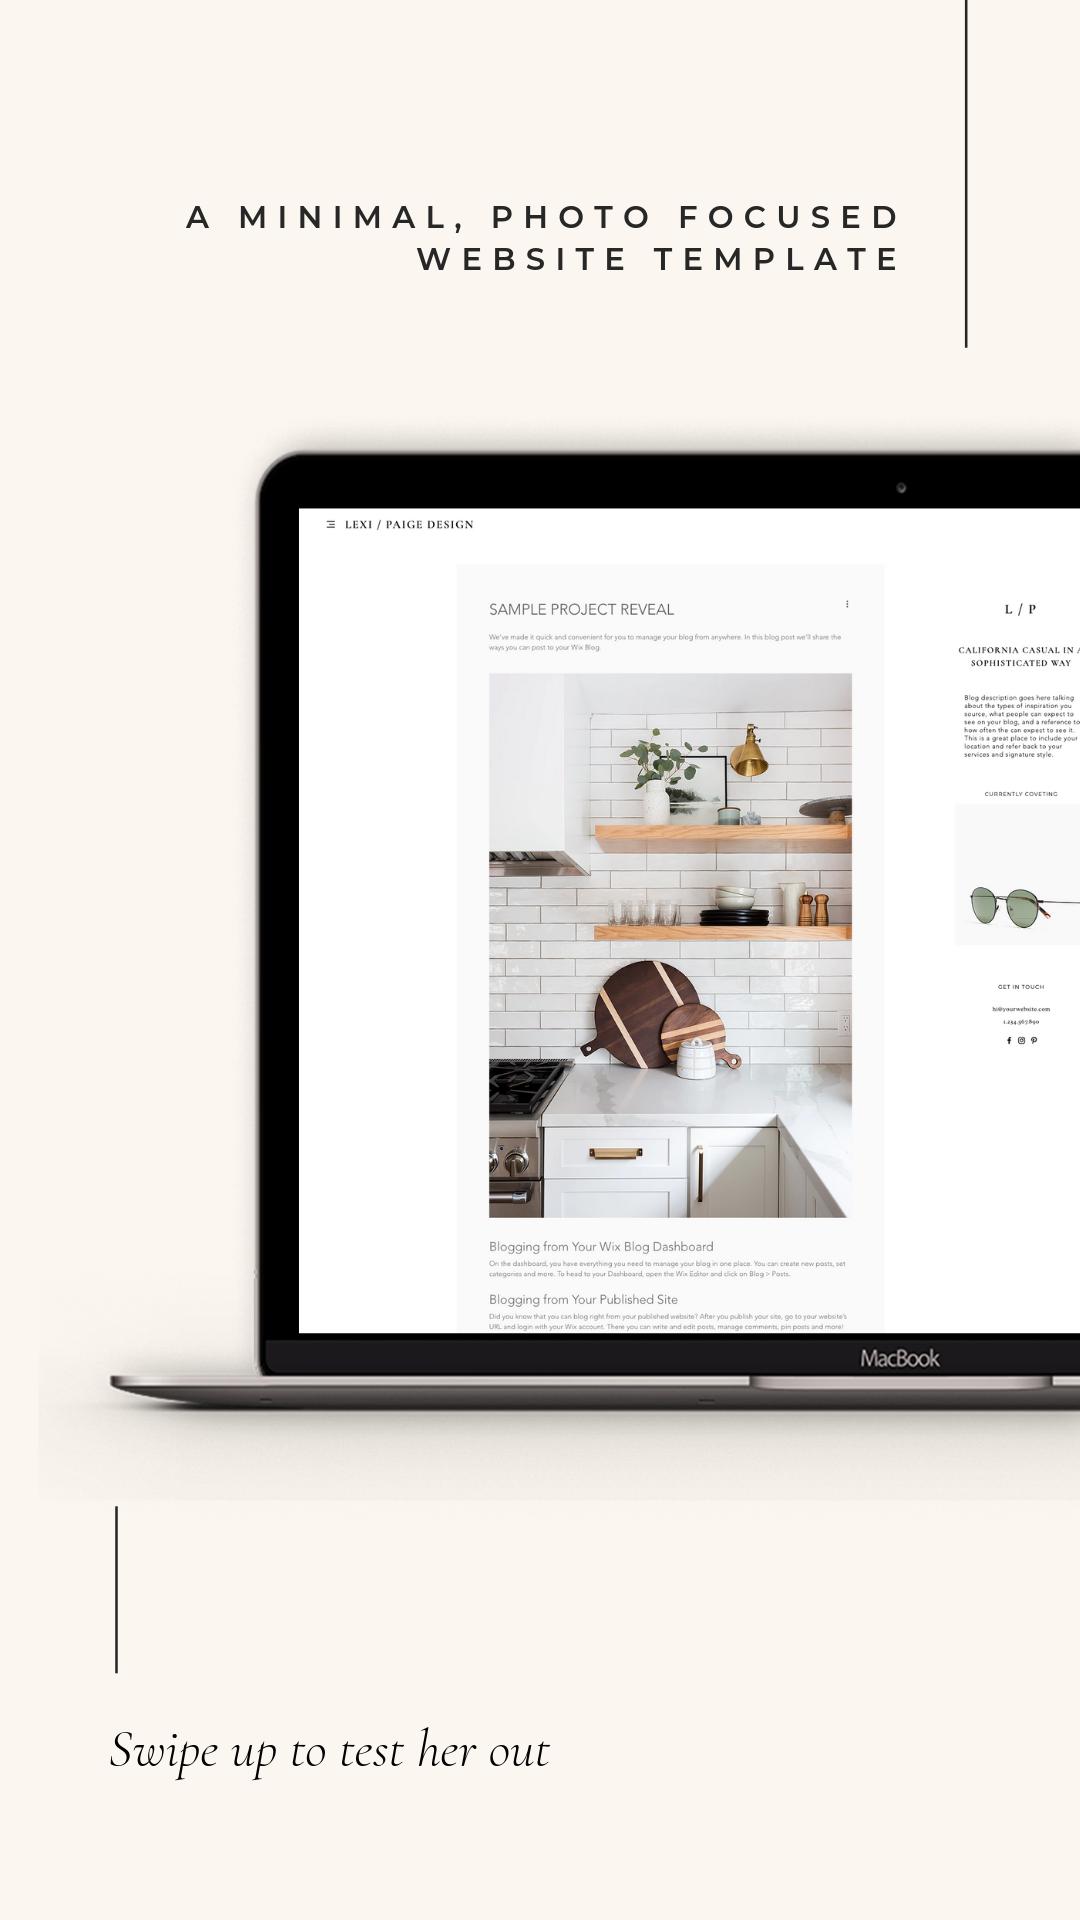 Meet The Lexi Beautiful Minimal Web Design Template For Interior